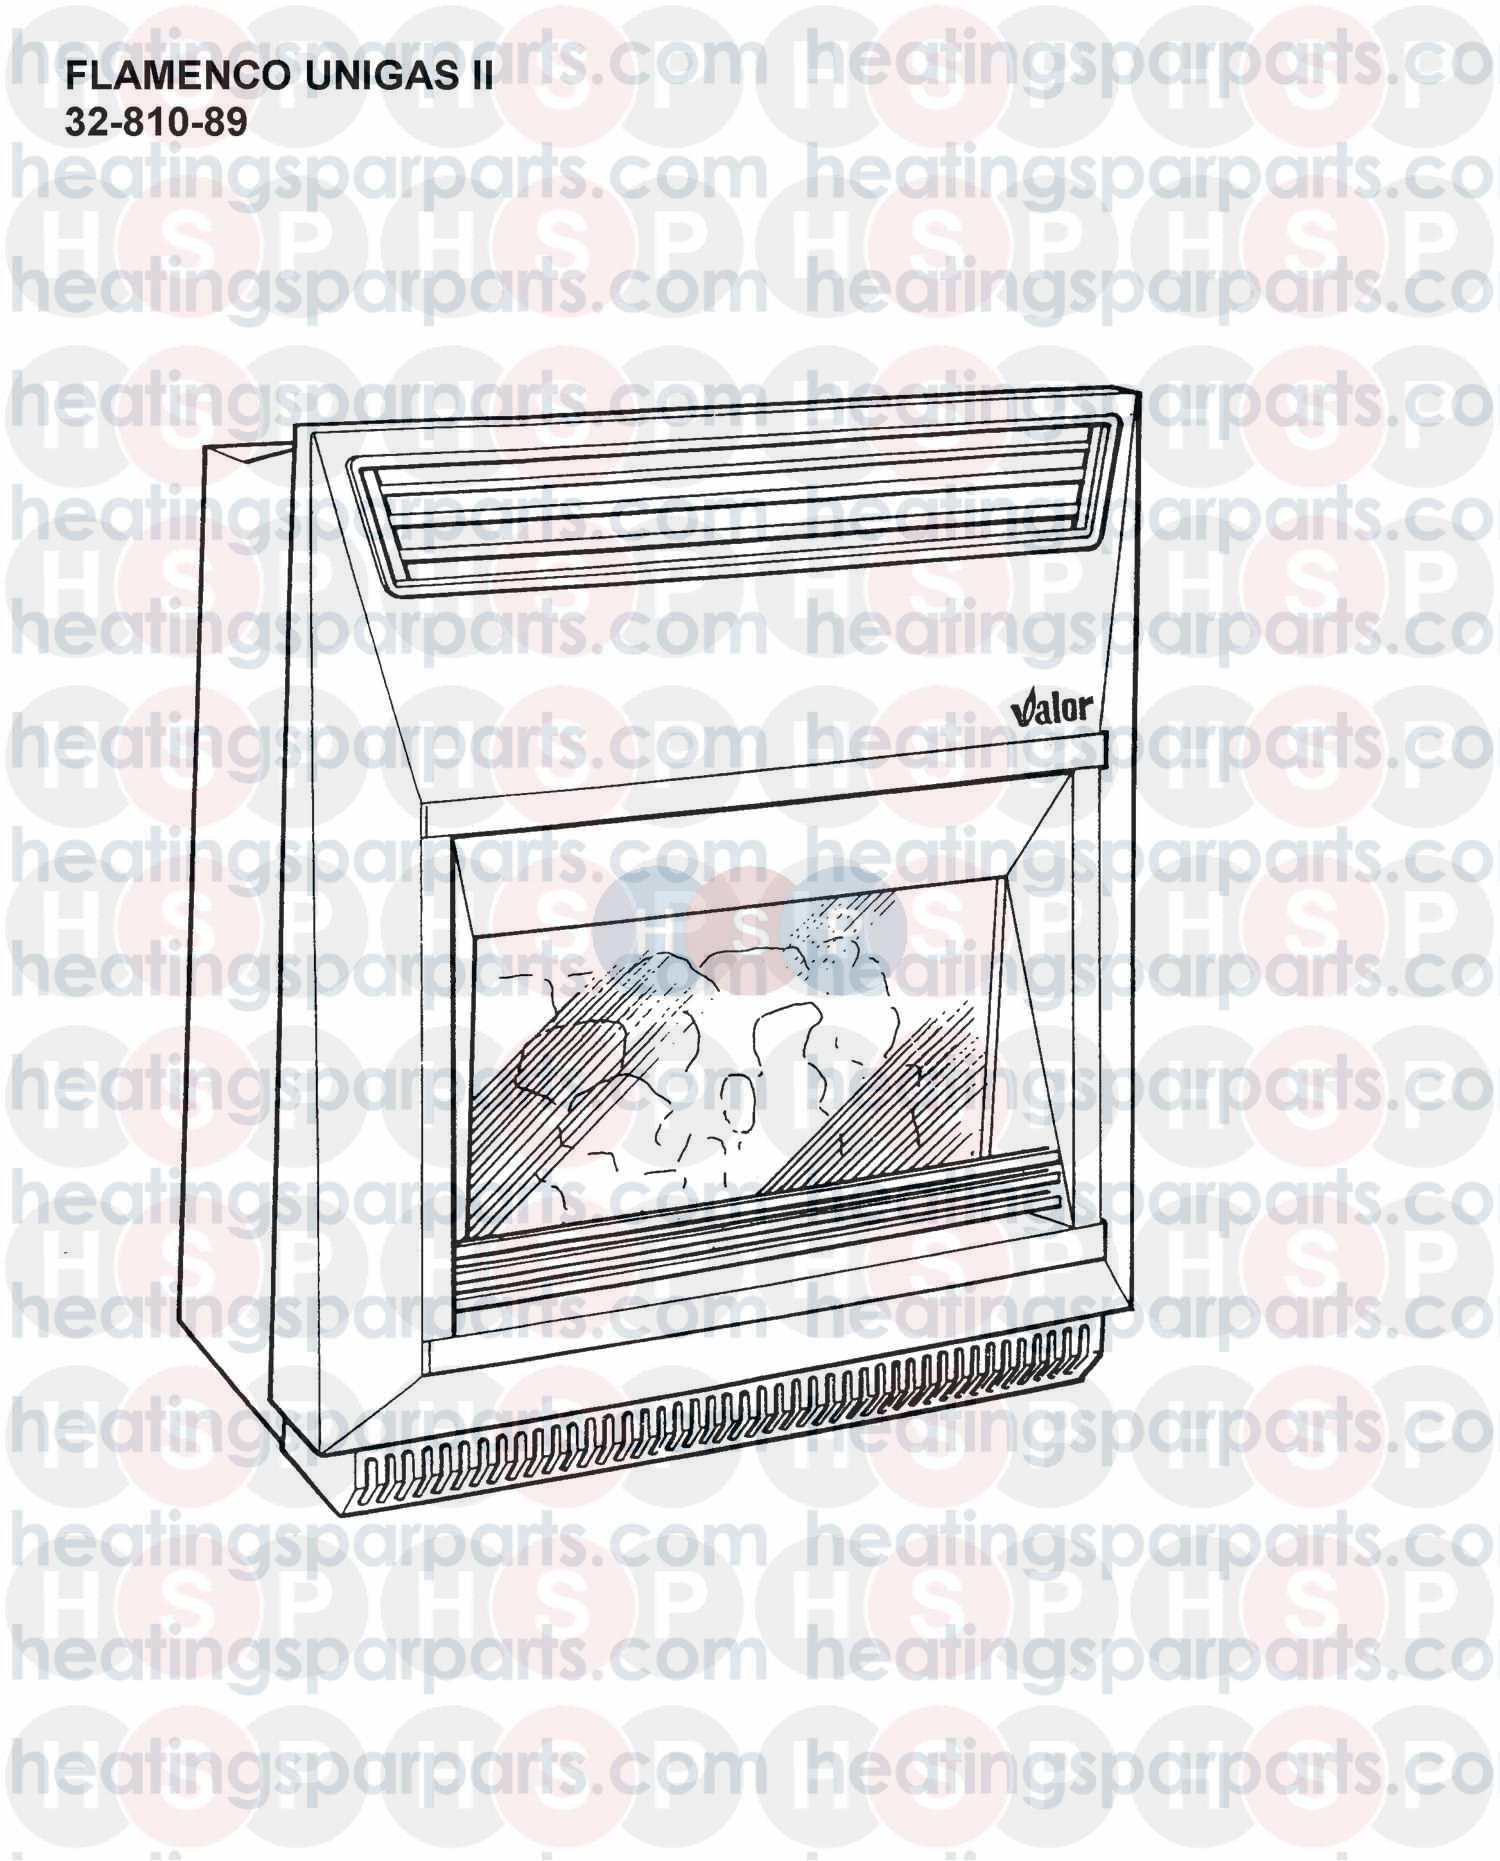 Valor Gas Fire Flamenco Unigas Ii  Appliance Overview  Diagram